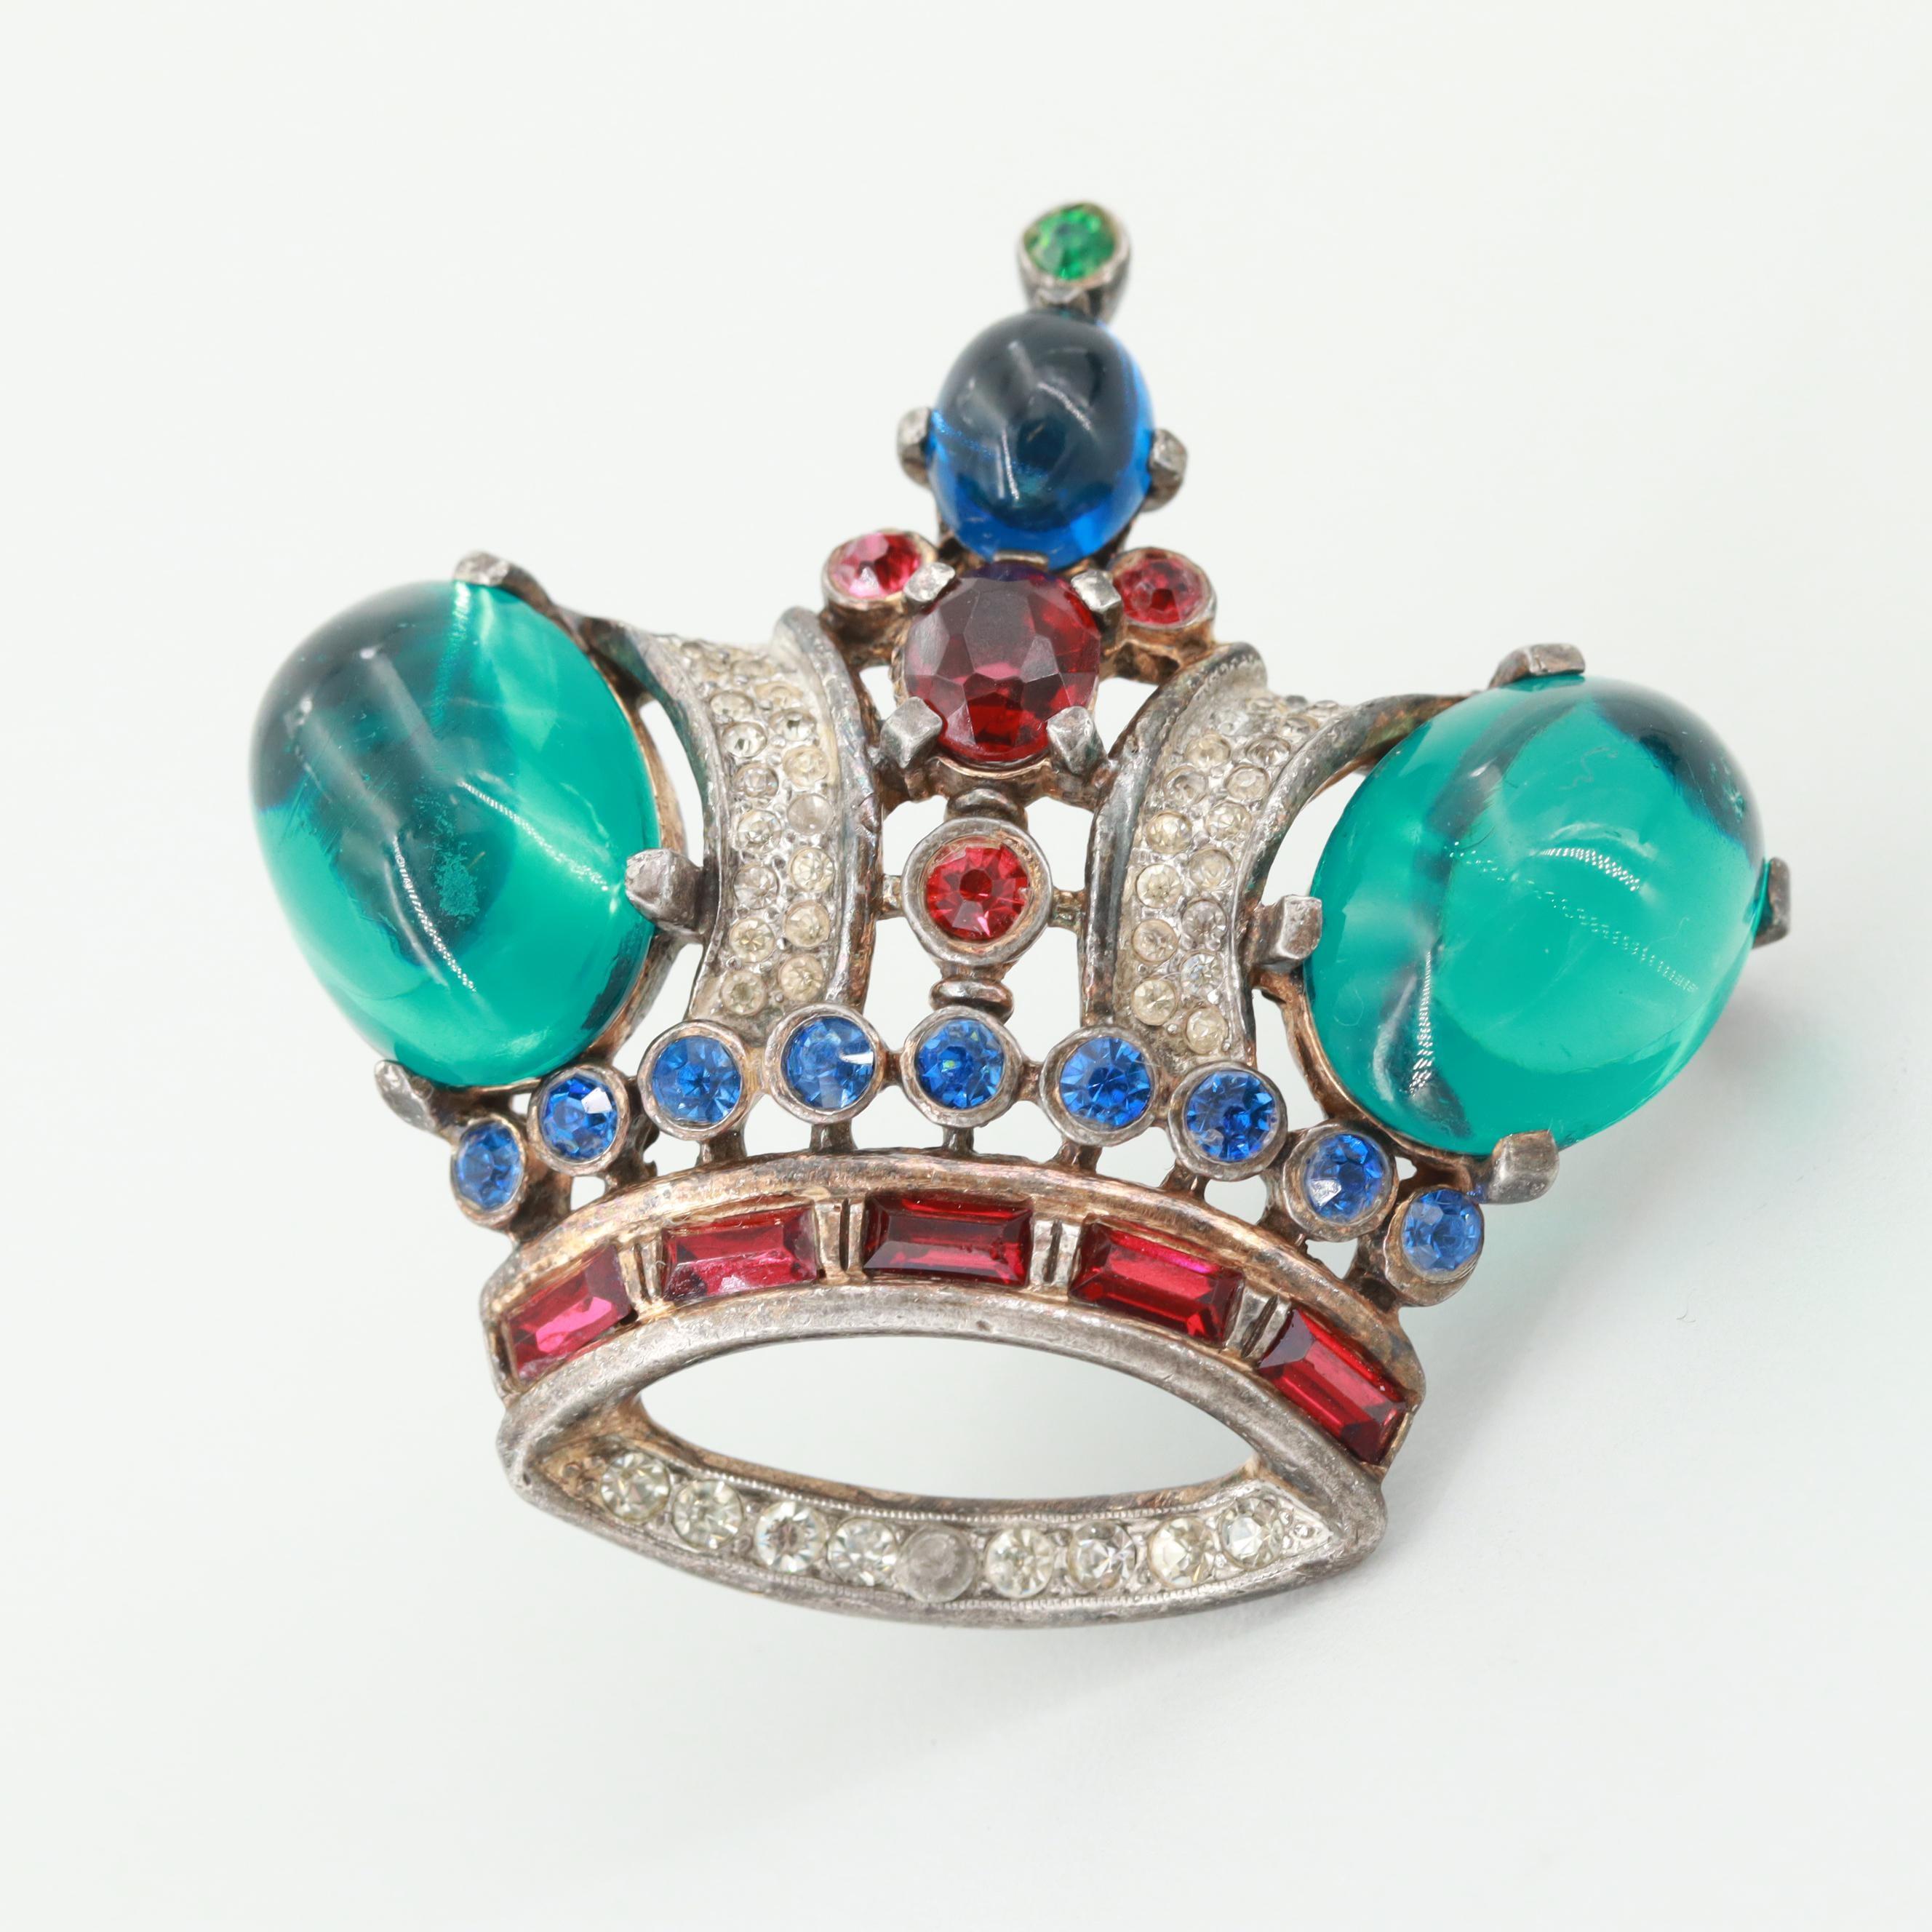 Circa 1940s Alfred Philippe Crown Trifari Silver Tone Glass Crown Brooch